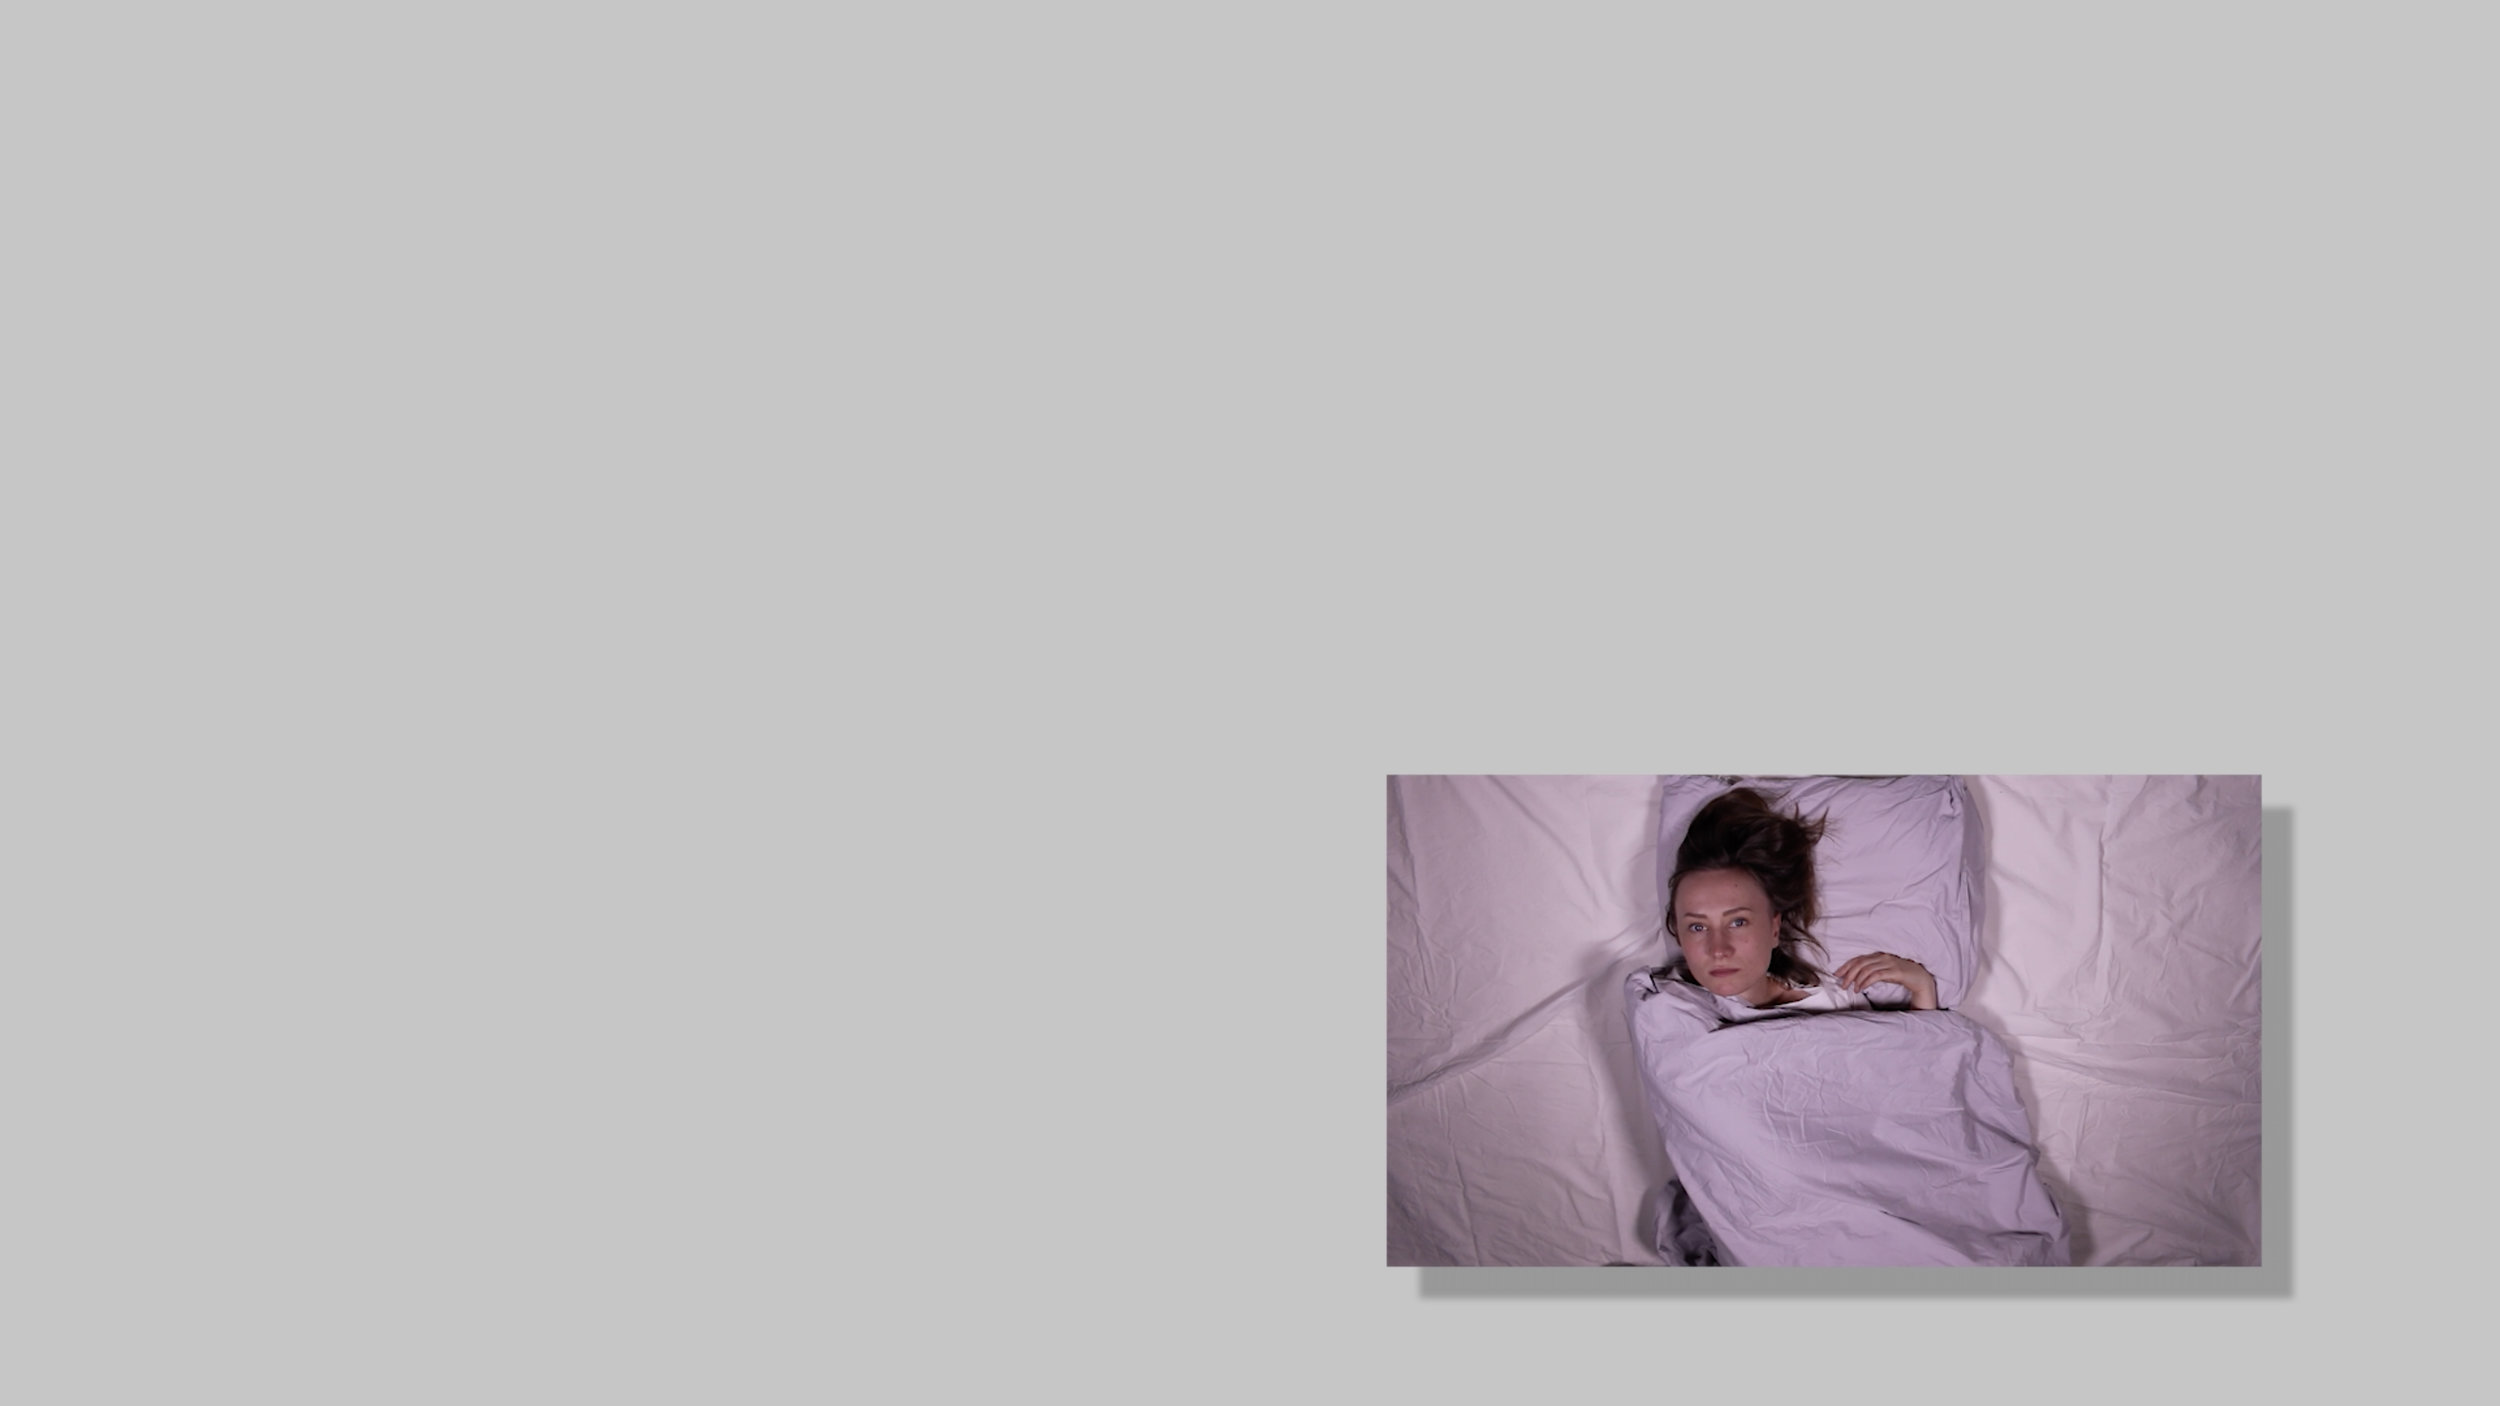 sickleave4_press_300dpi.jpg